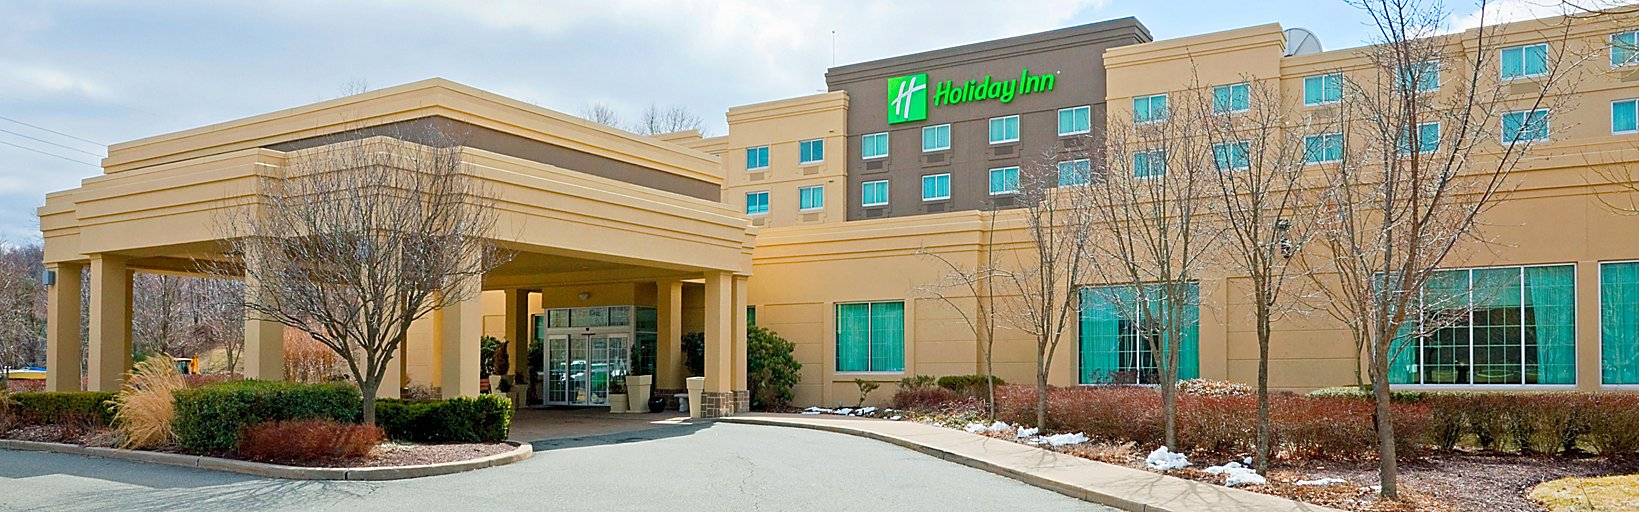 Budd Lake, NJ Hotels Near Hackettstown | Holiday Inn Budd